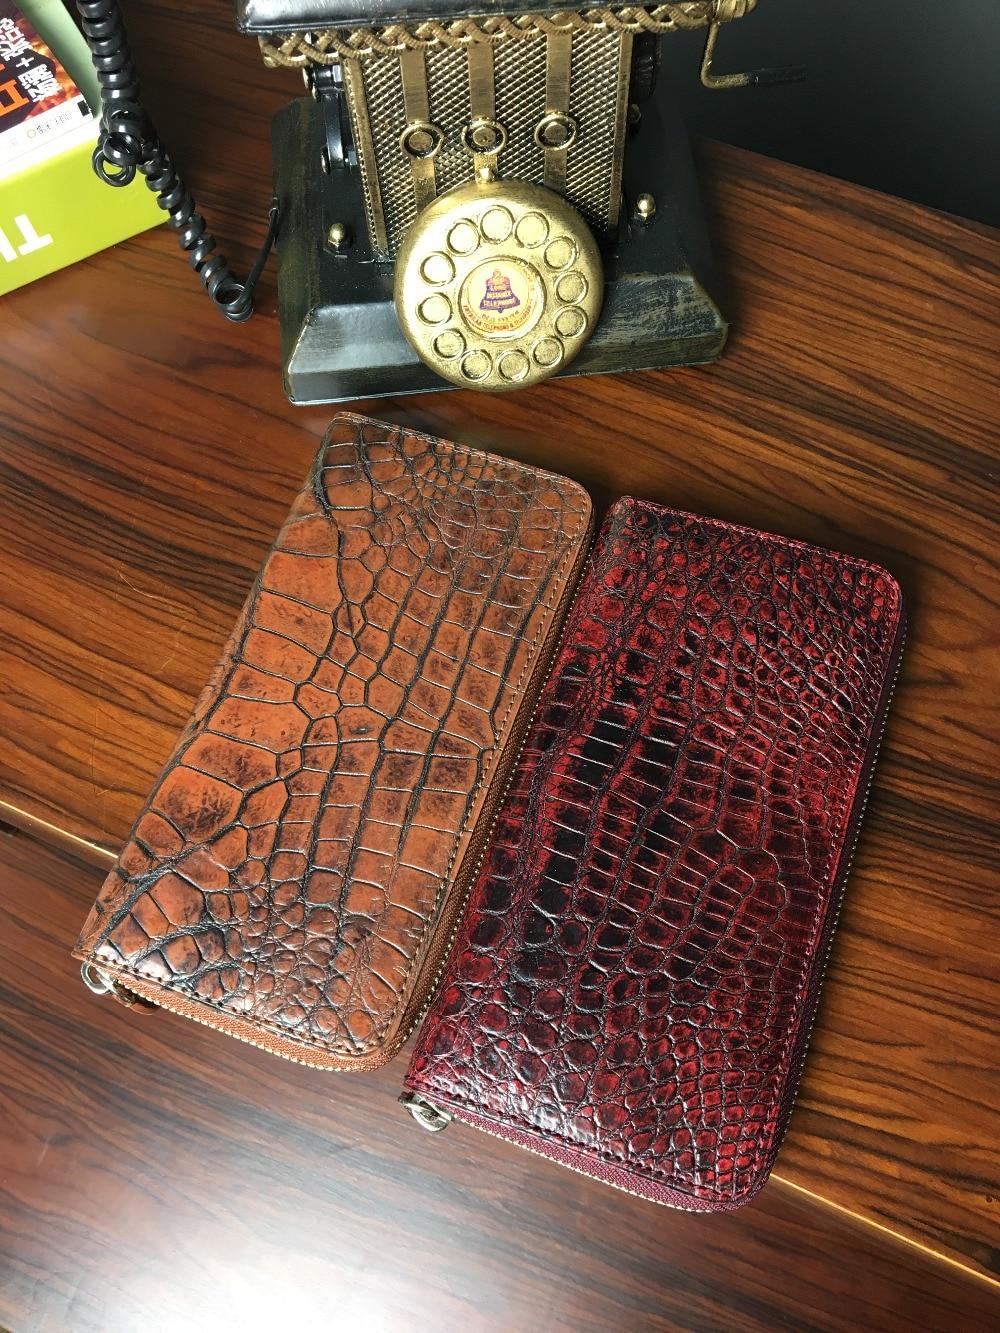 TERSE_Black Friday sale womens handmade long wallet luxury genuine crocodile leather purse formal crocodile clutch bag